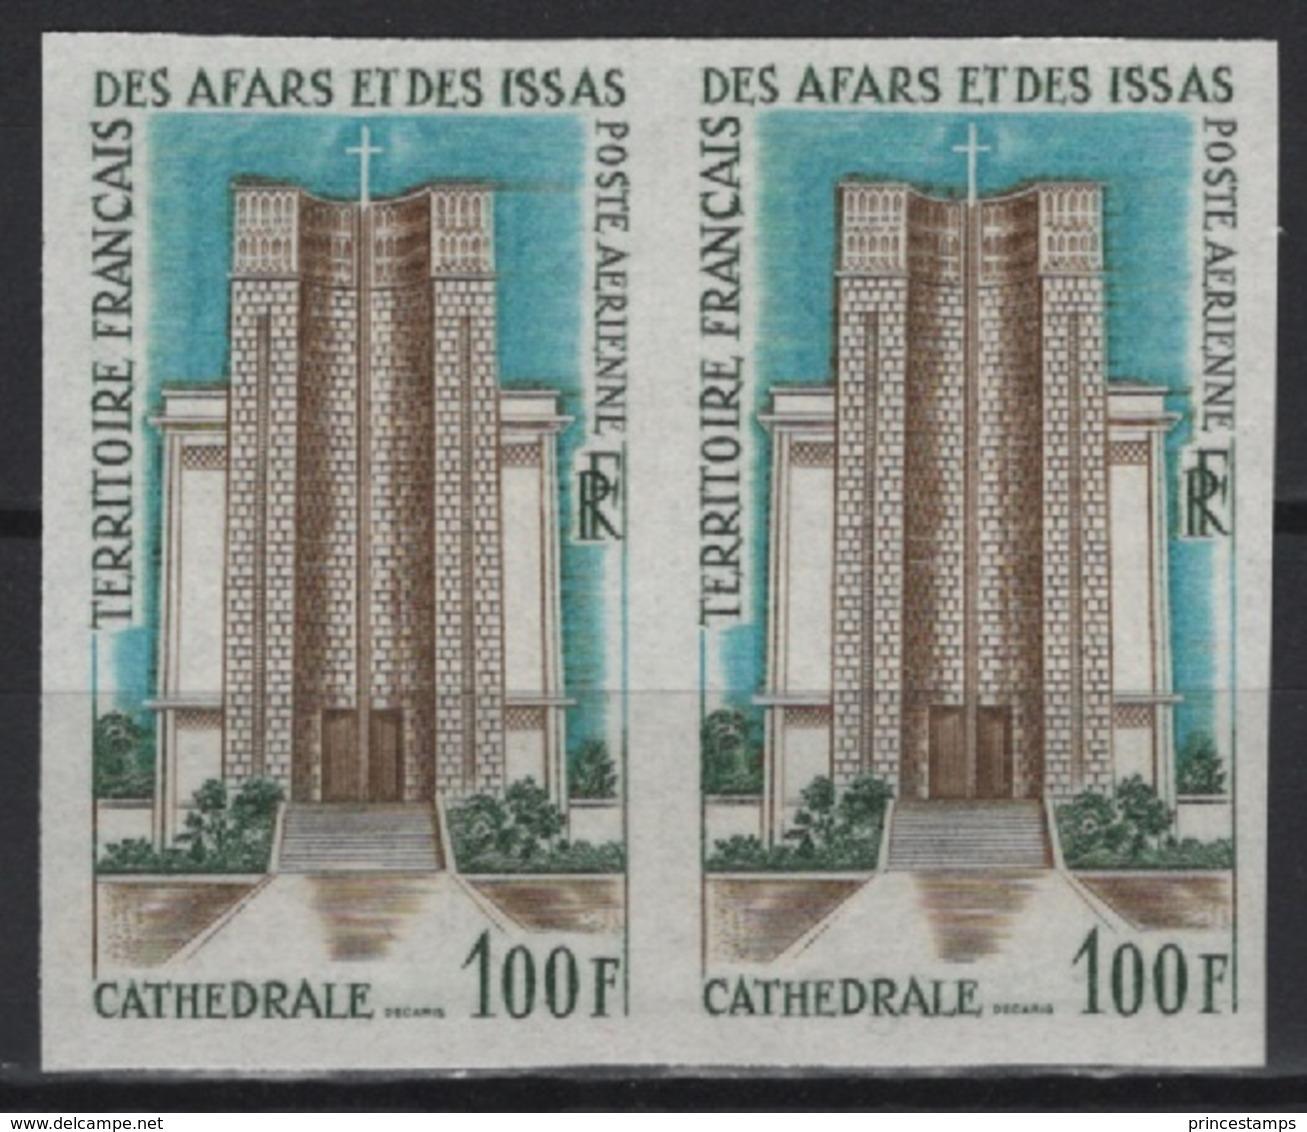 Afars Et Issas (1968)  Yv. Av. 61- Pair /  Cathedral - Architecture - Maps - NON DENTELE - IMPERFORATED - Kerken En Kathedralen